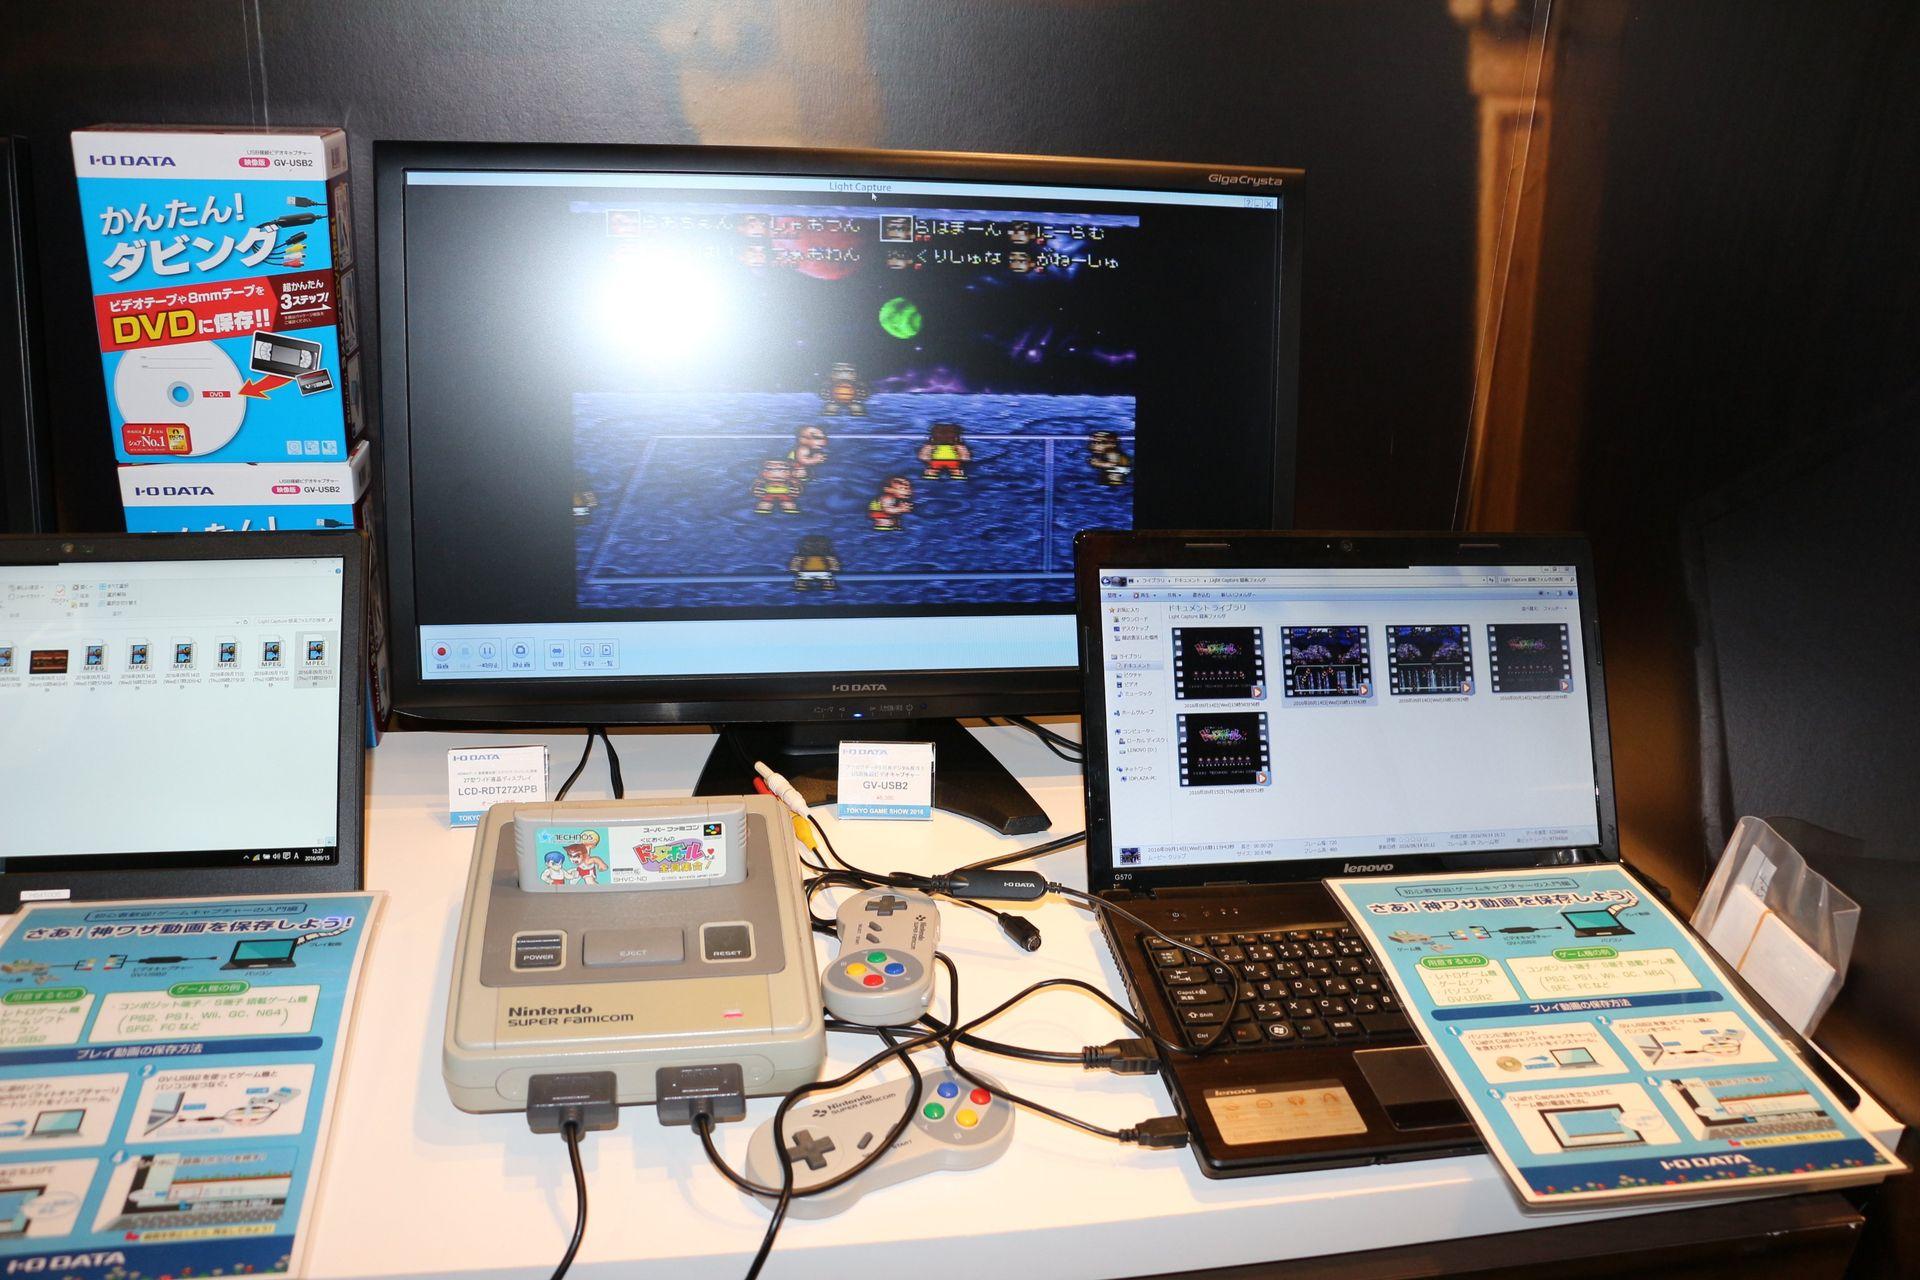 PCやAndroidデバイスにアナログビデオ映像をデジタル保存できる。小さすぎてケーブルと見間違えてしまう